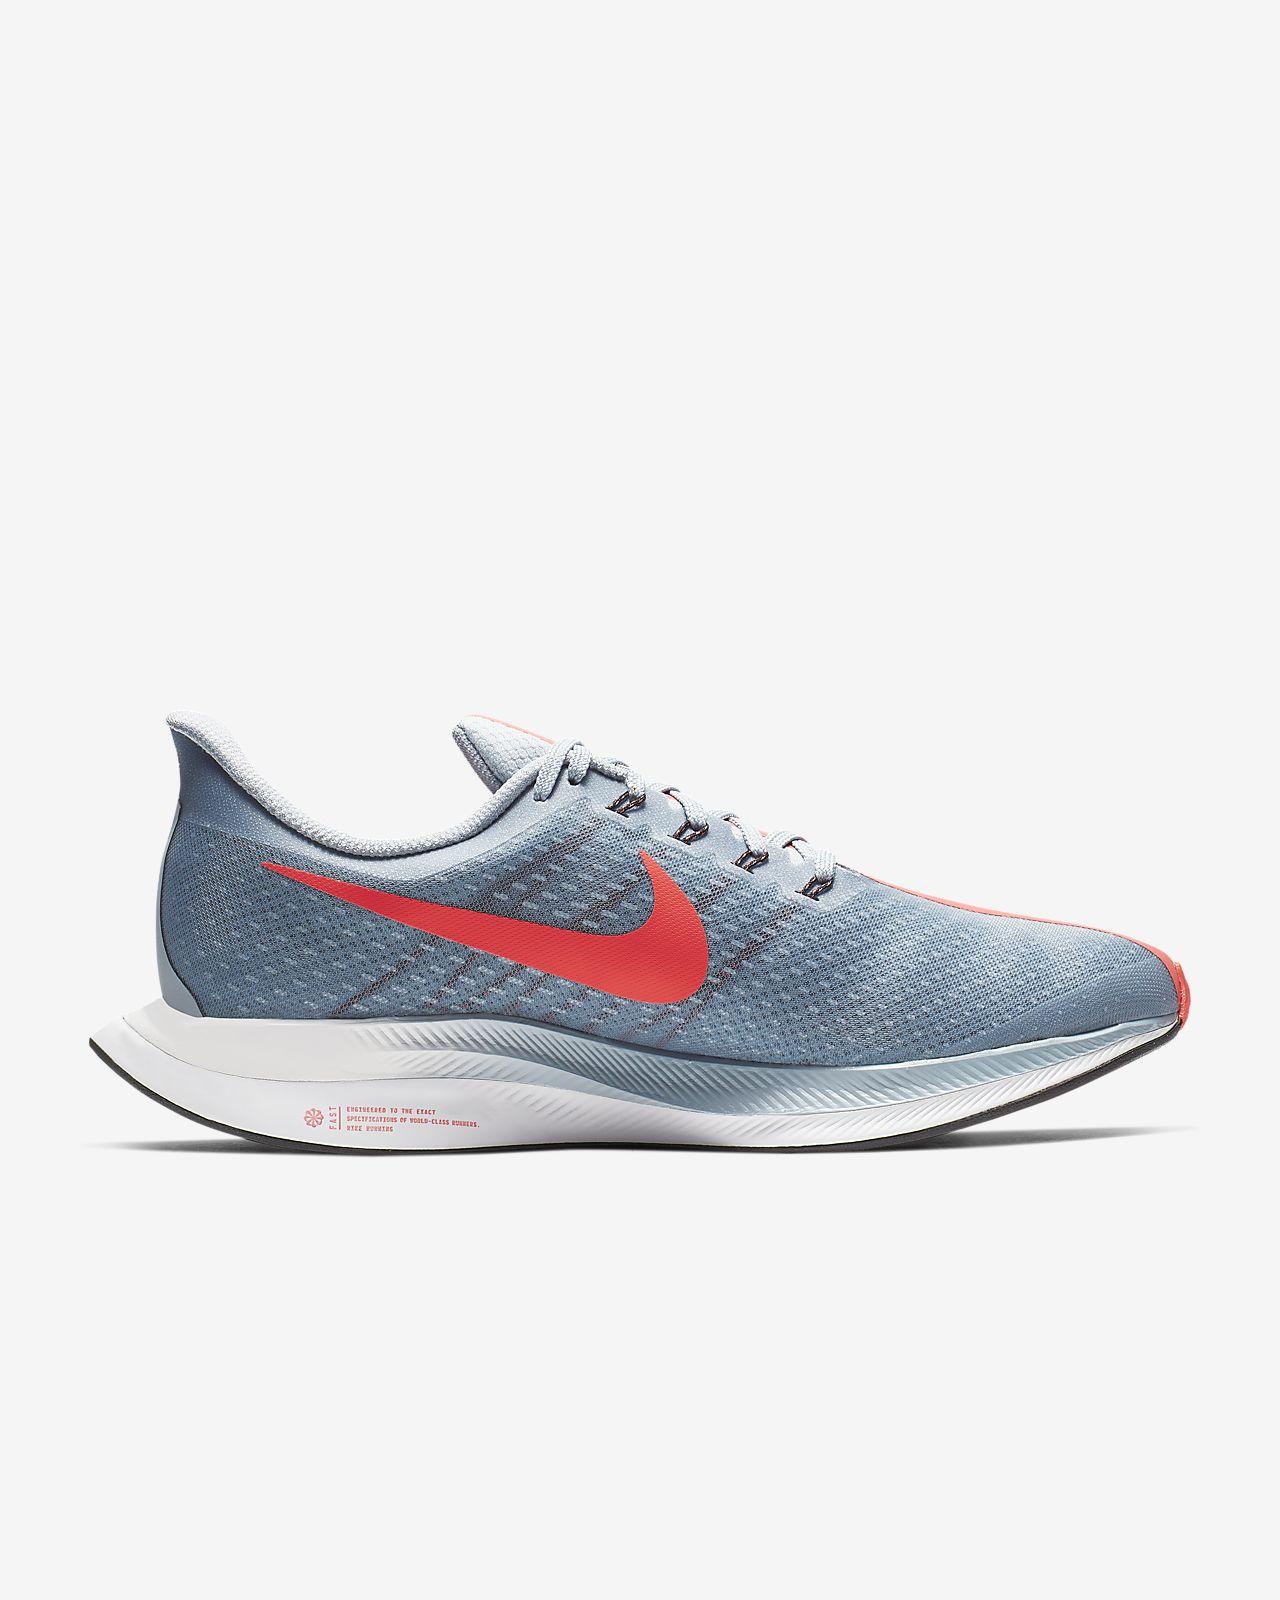 buy cheap 2ff36 2e09b ... Chaussure de running Nike Zoom Pegasus Turbo pour Homme